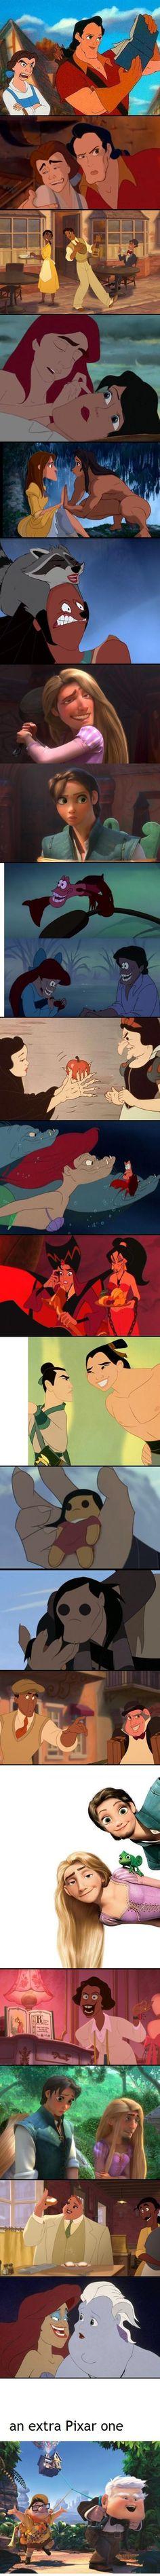 hahahahahaha i think i died laughing so hard i couldn't stop!!